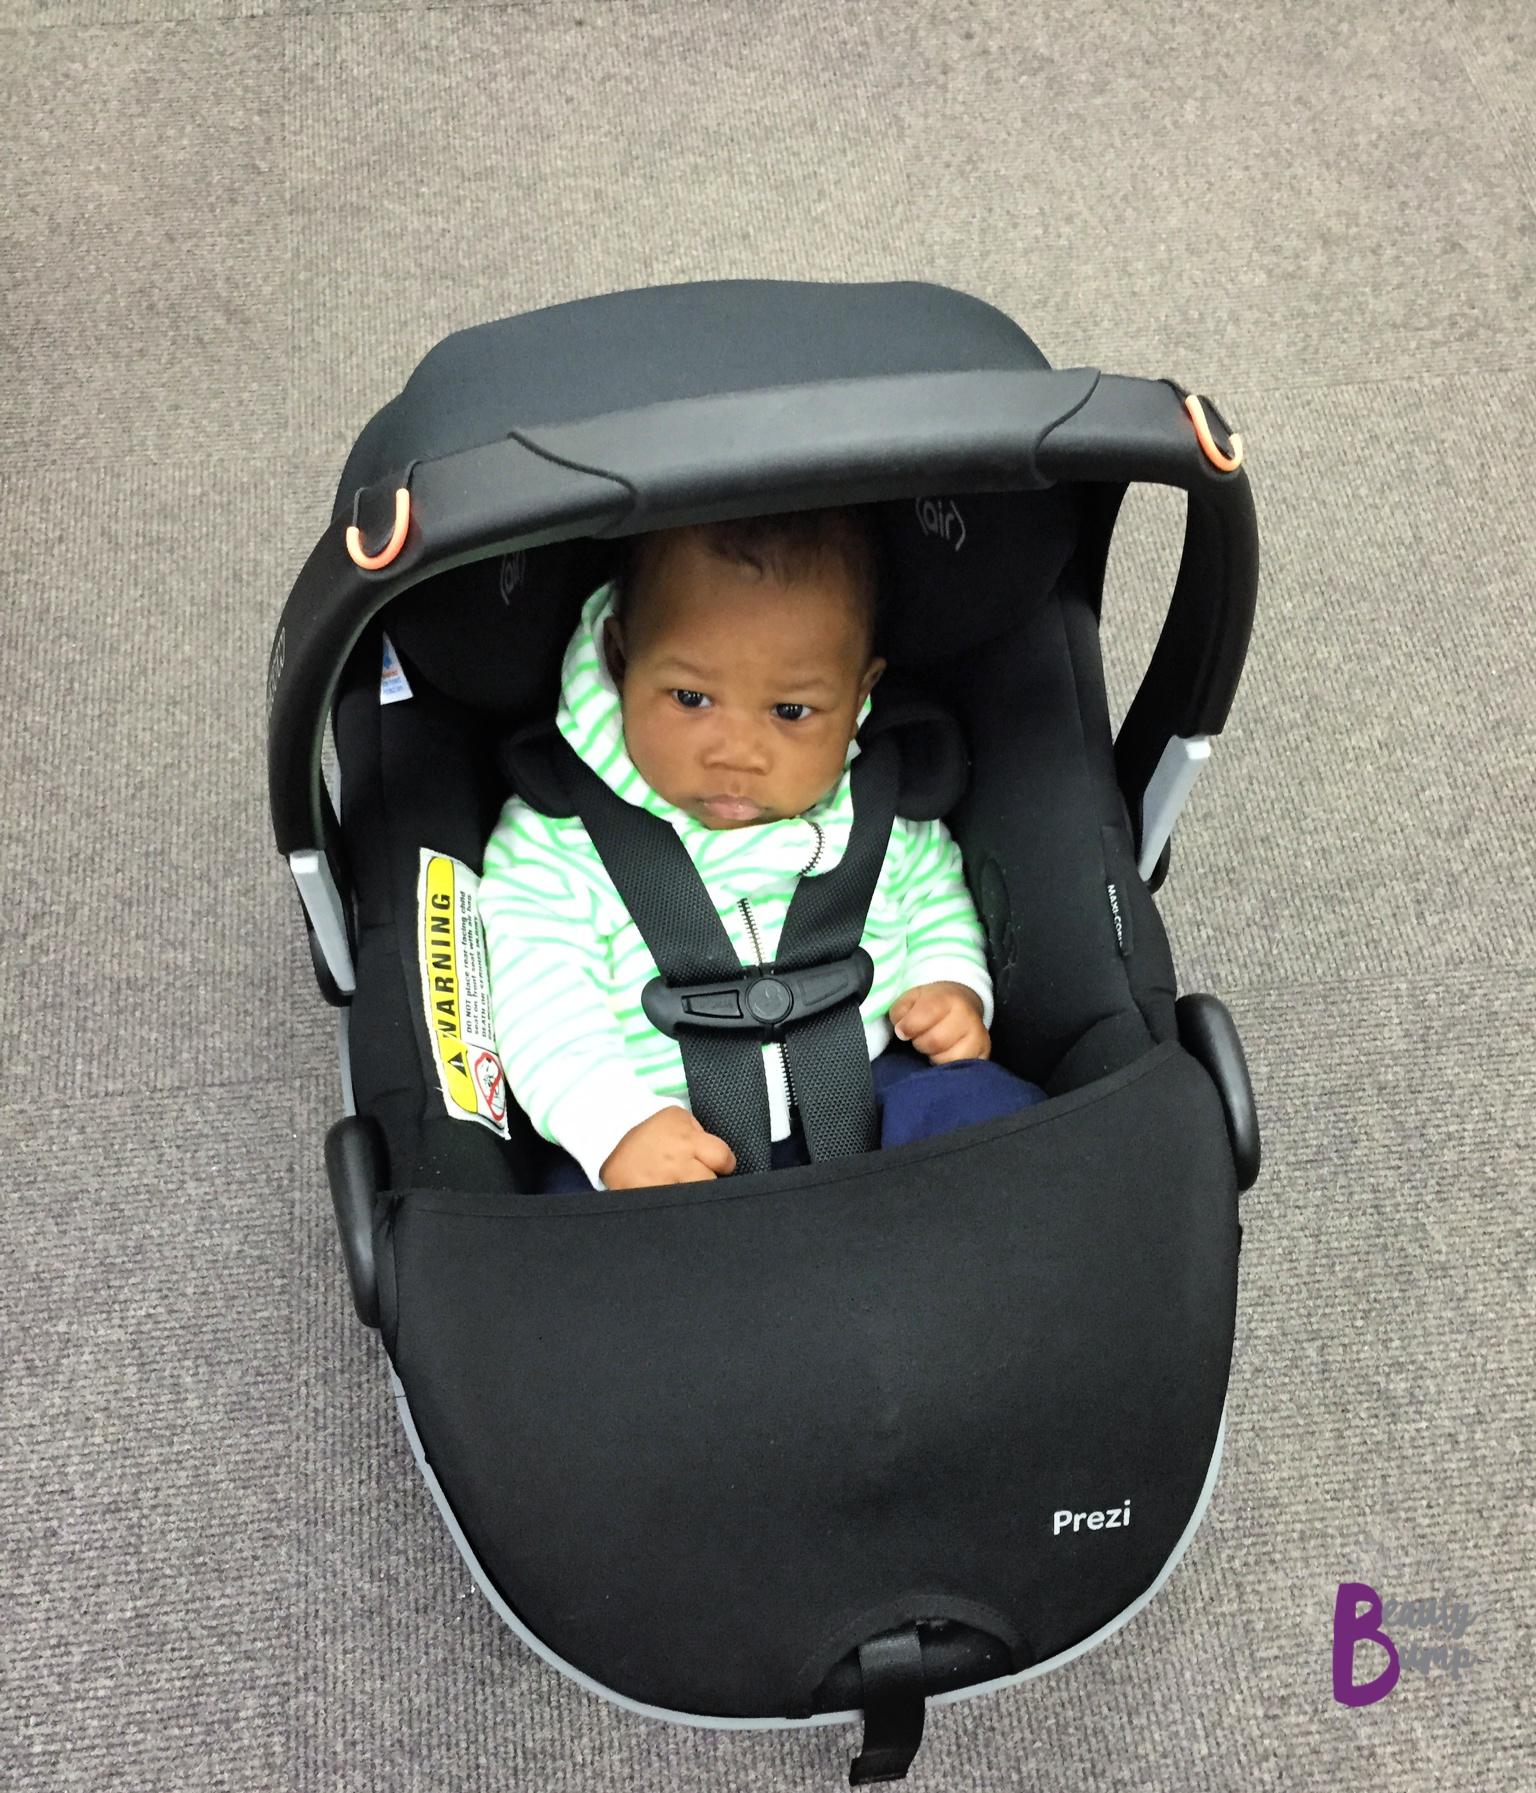 Maxi-Cosi Magellan 5 in 1 Convertible Car Seat Child Safety 2018 Emerald Tide